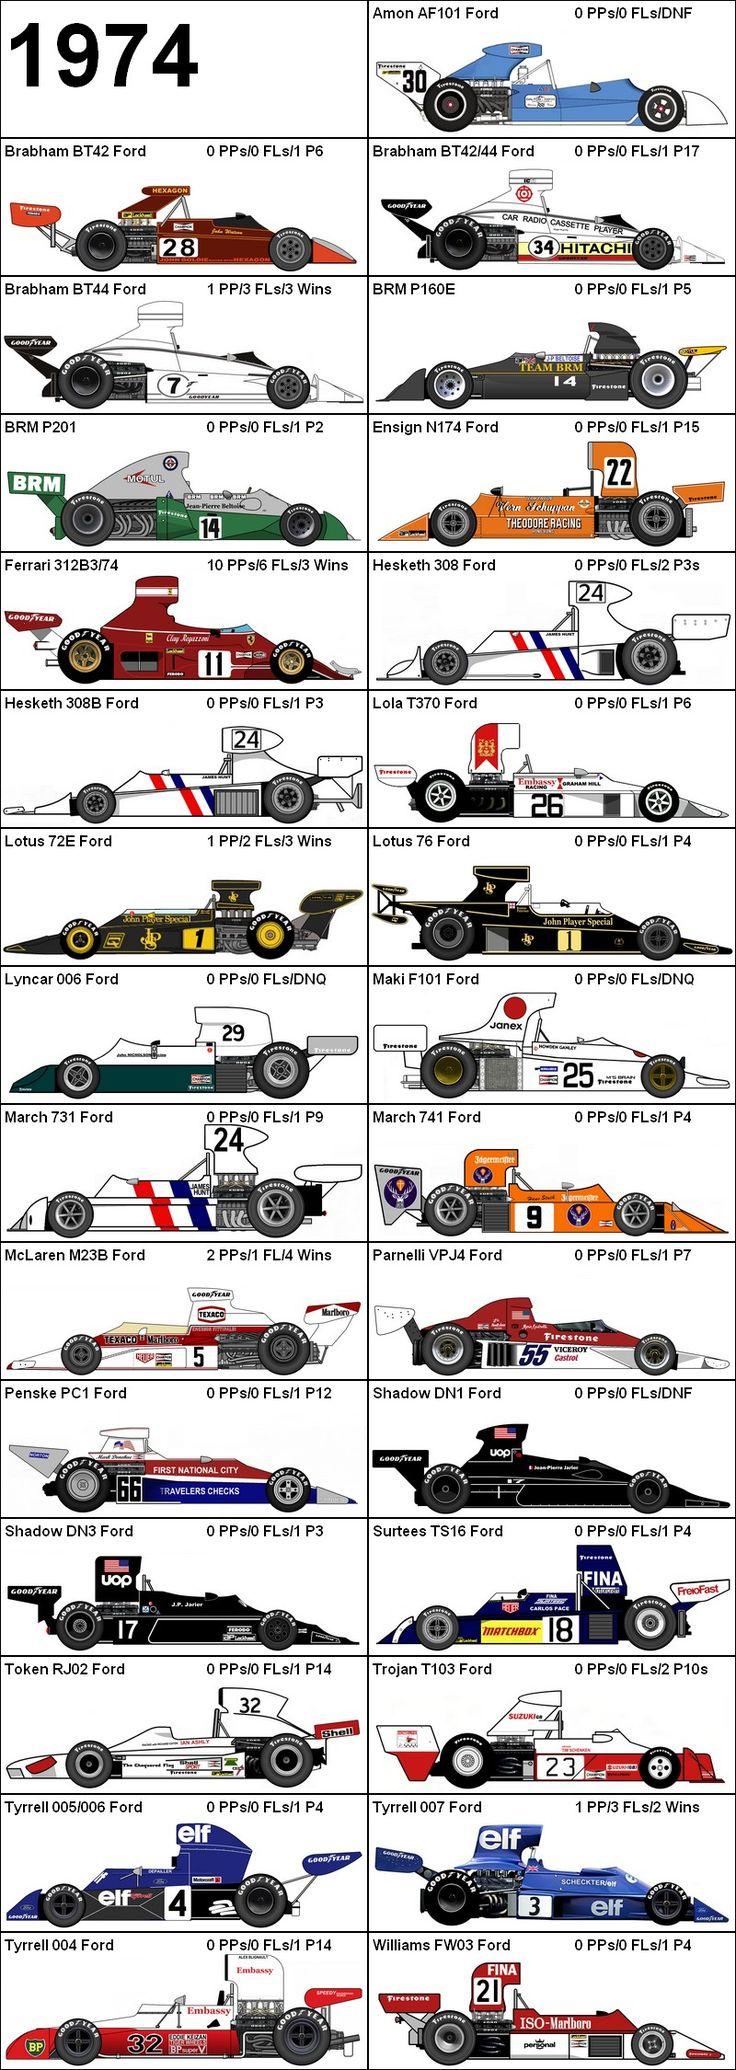 Formula One Grand Prix 1974 Cars